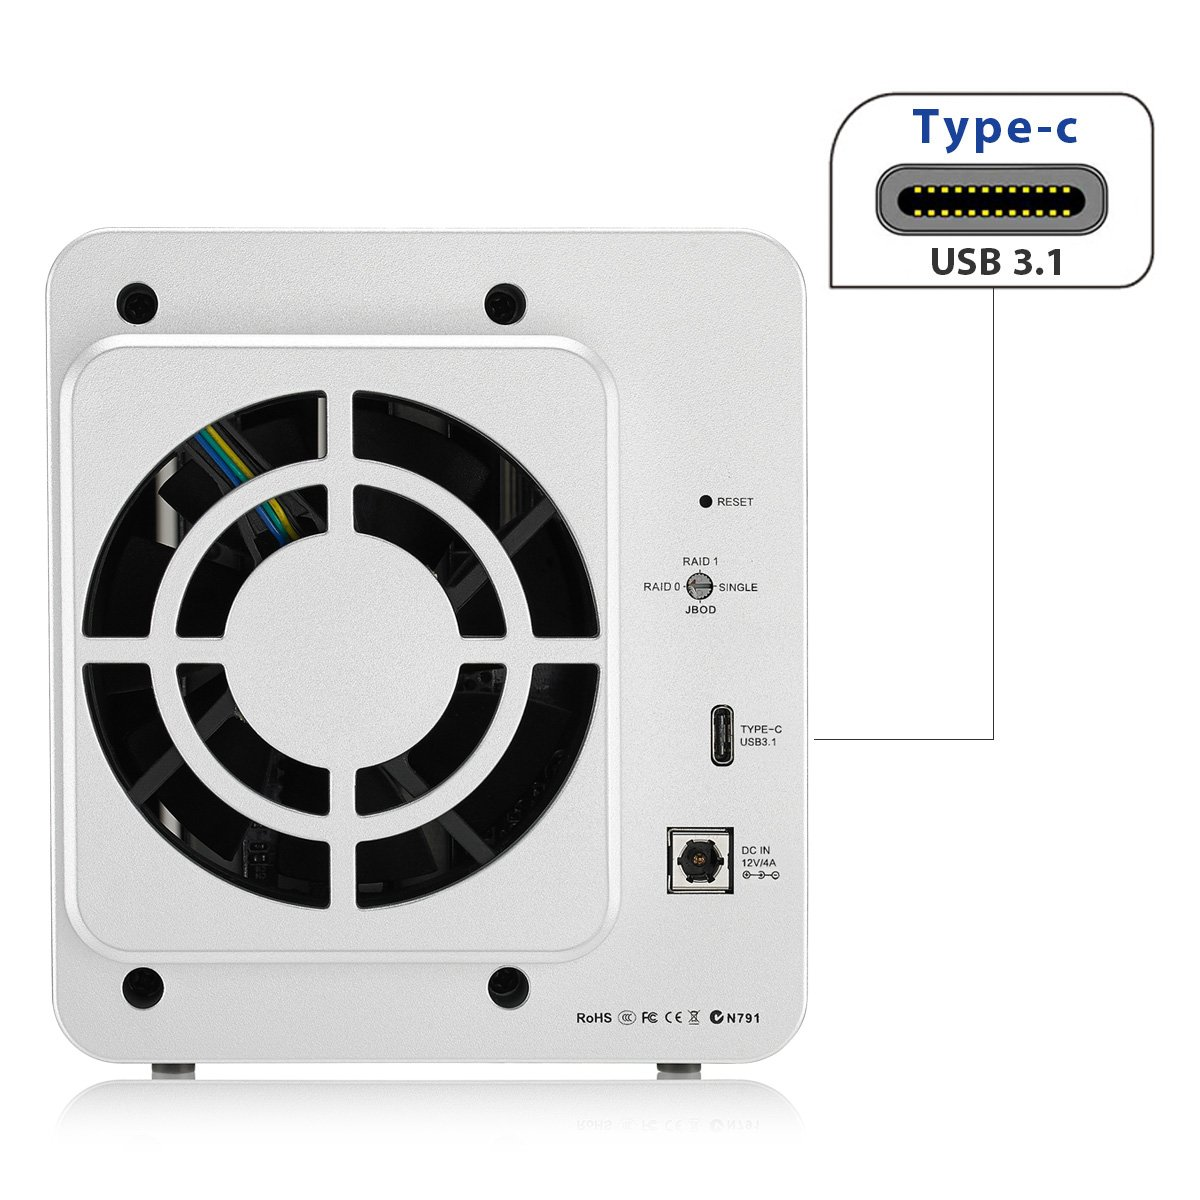 TerraMaster D2-310 USB Tipo C Disco Duro Externo Raid Caja USB3.1 (Gen1, 5Gbps) 2 Bahía Raid Almacenamiento (Sin Disco): Amazon.es: Electrónica